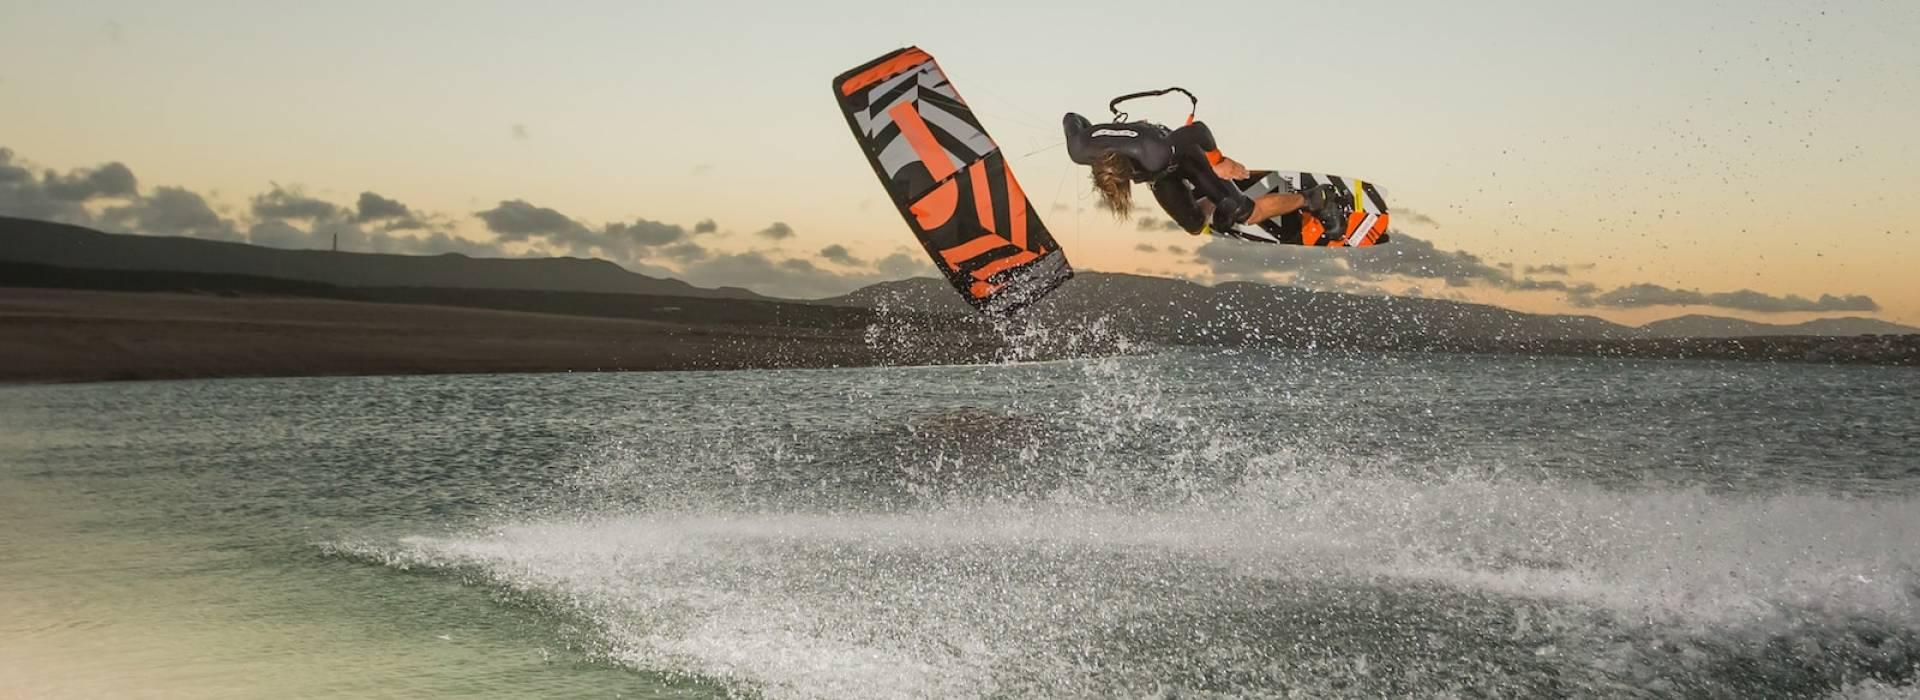 kitesurf lessen op 360 graden